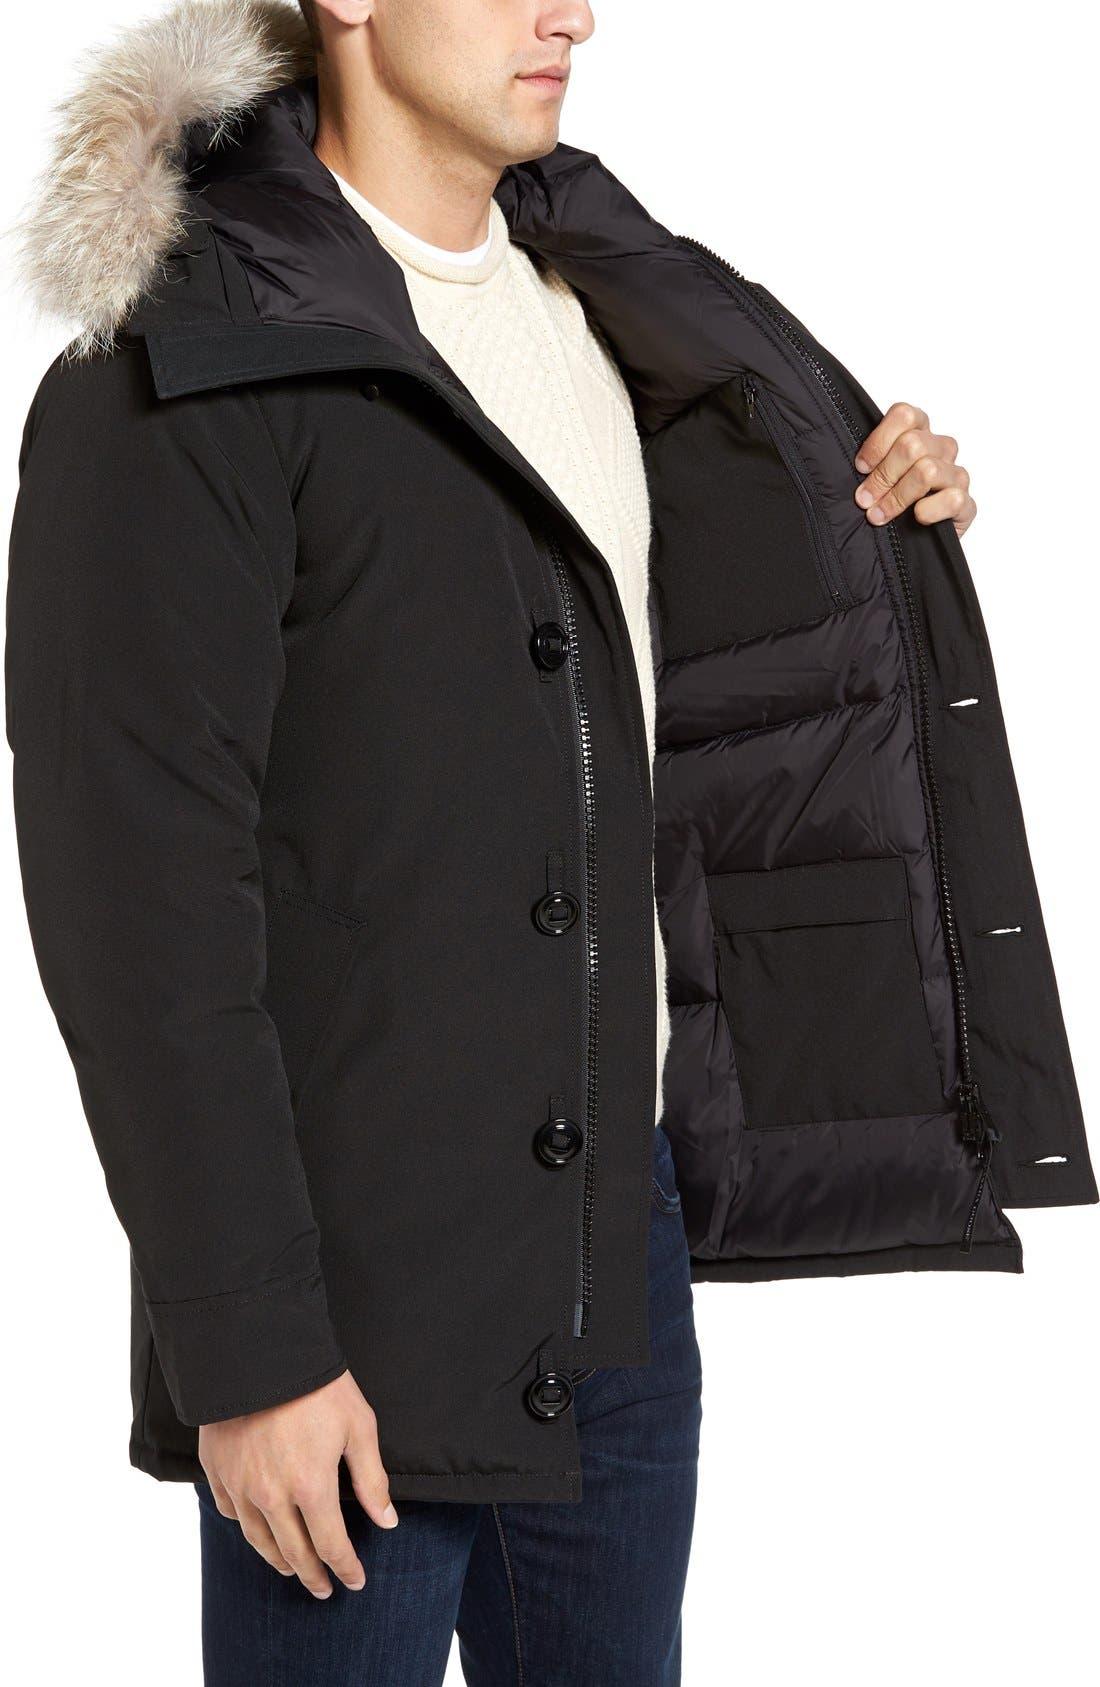 Alternate Image 3  - Canada Goose 'Chateau' Slim Fit Genuine Coyote Fur Trim Jacket